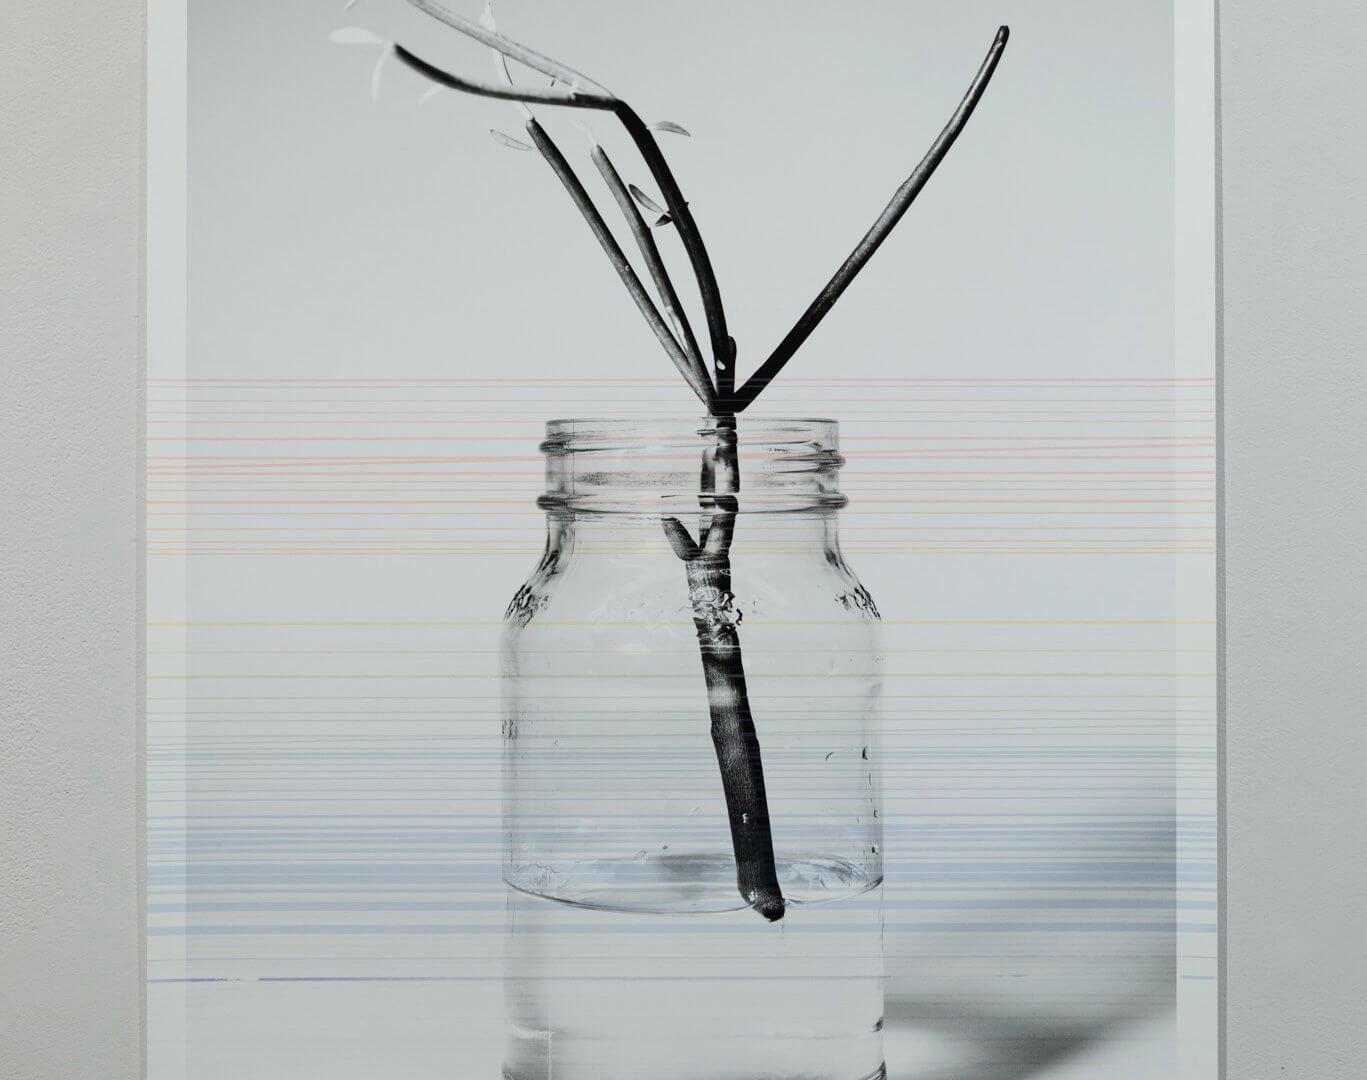 "Futures Barren Film Stills: II by April Dean. Inkjet and screen print. 36 x 24"". 2019. Image credit: Sarah Fuller."